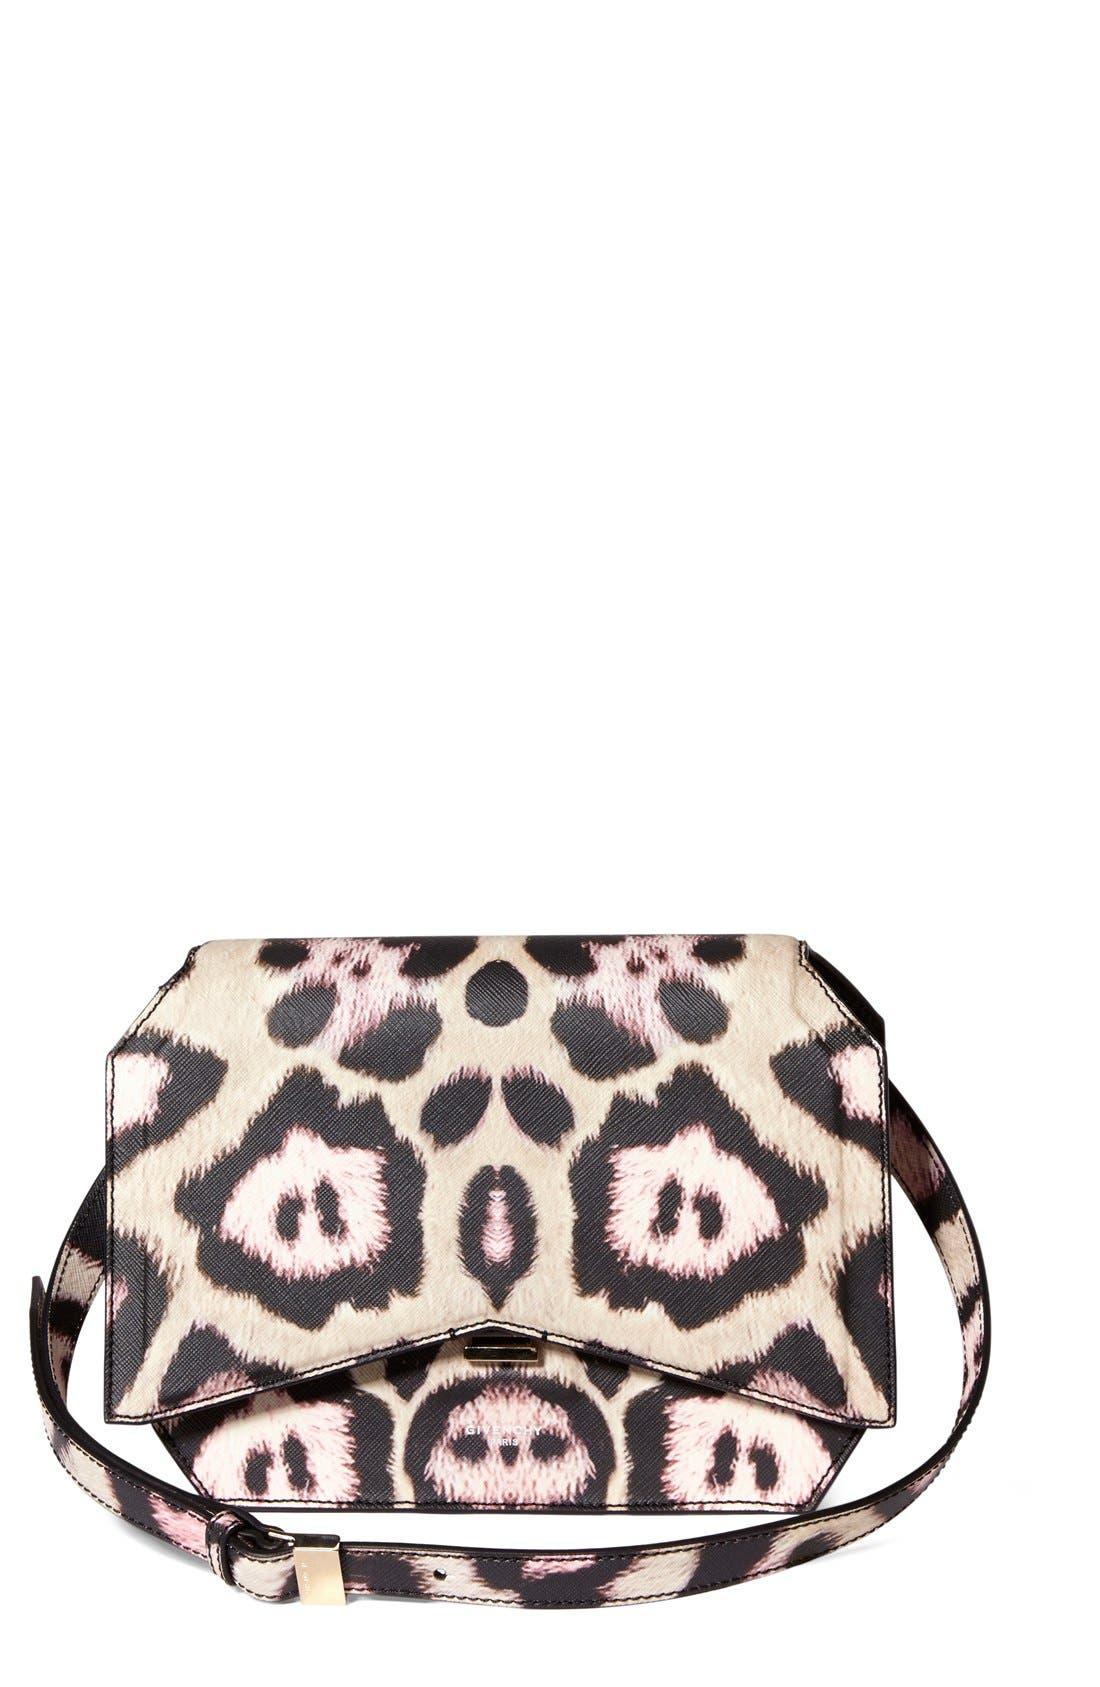 Main Image - Givenchy 'Medium Bow-Cut' Jaguar Print Leather Shoulder Bag